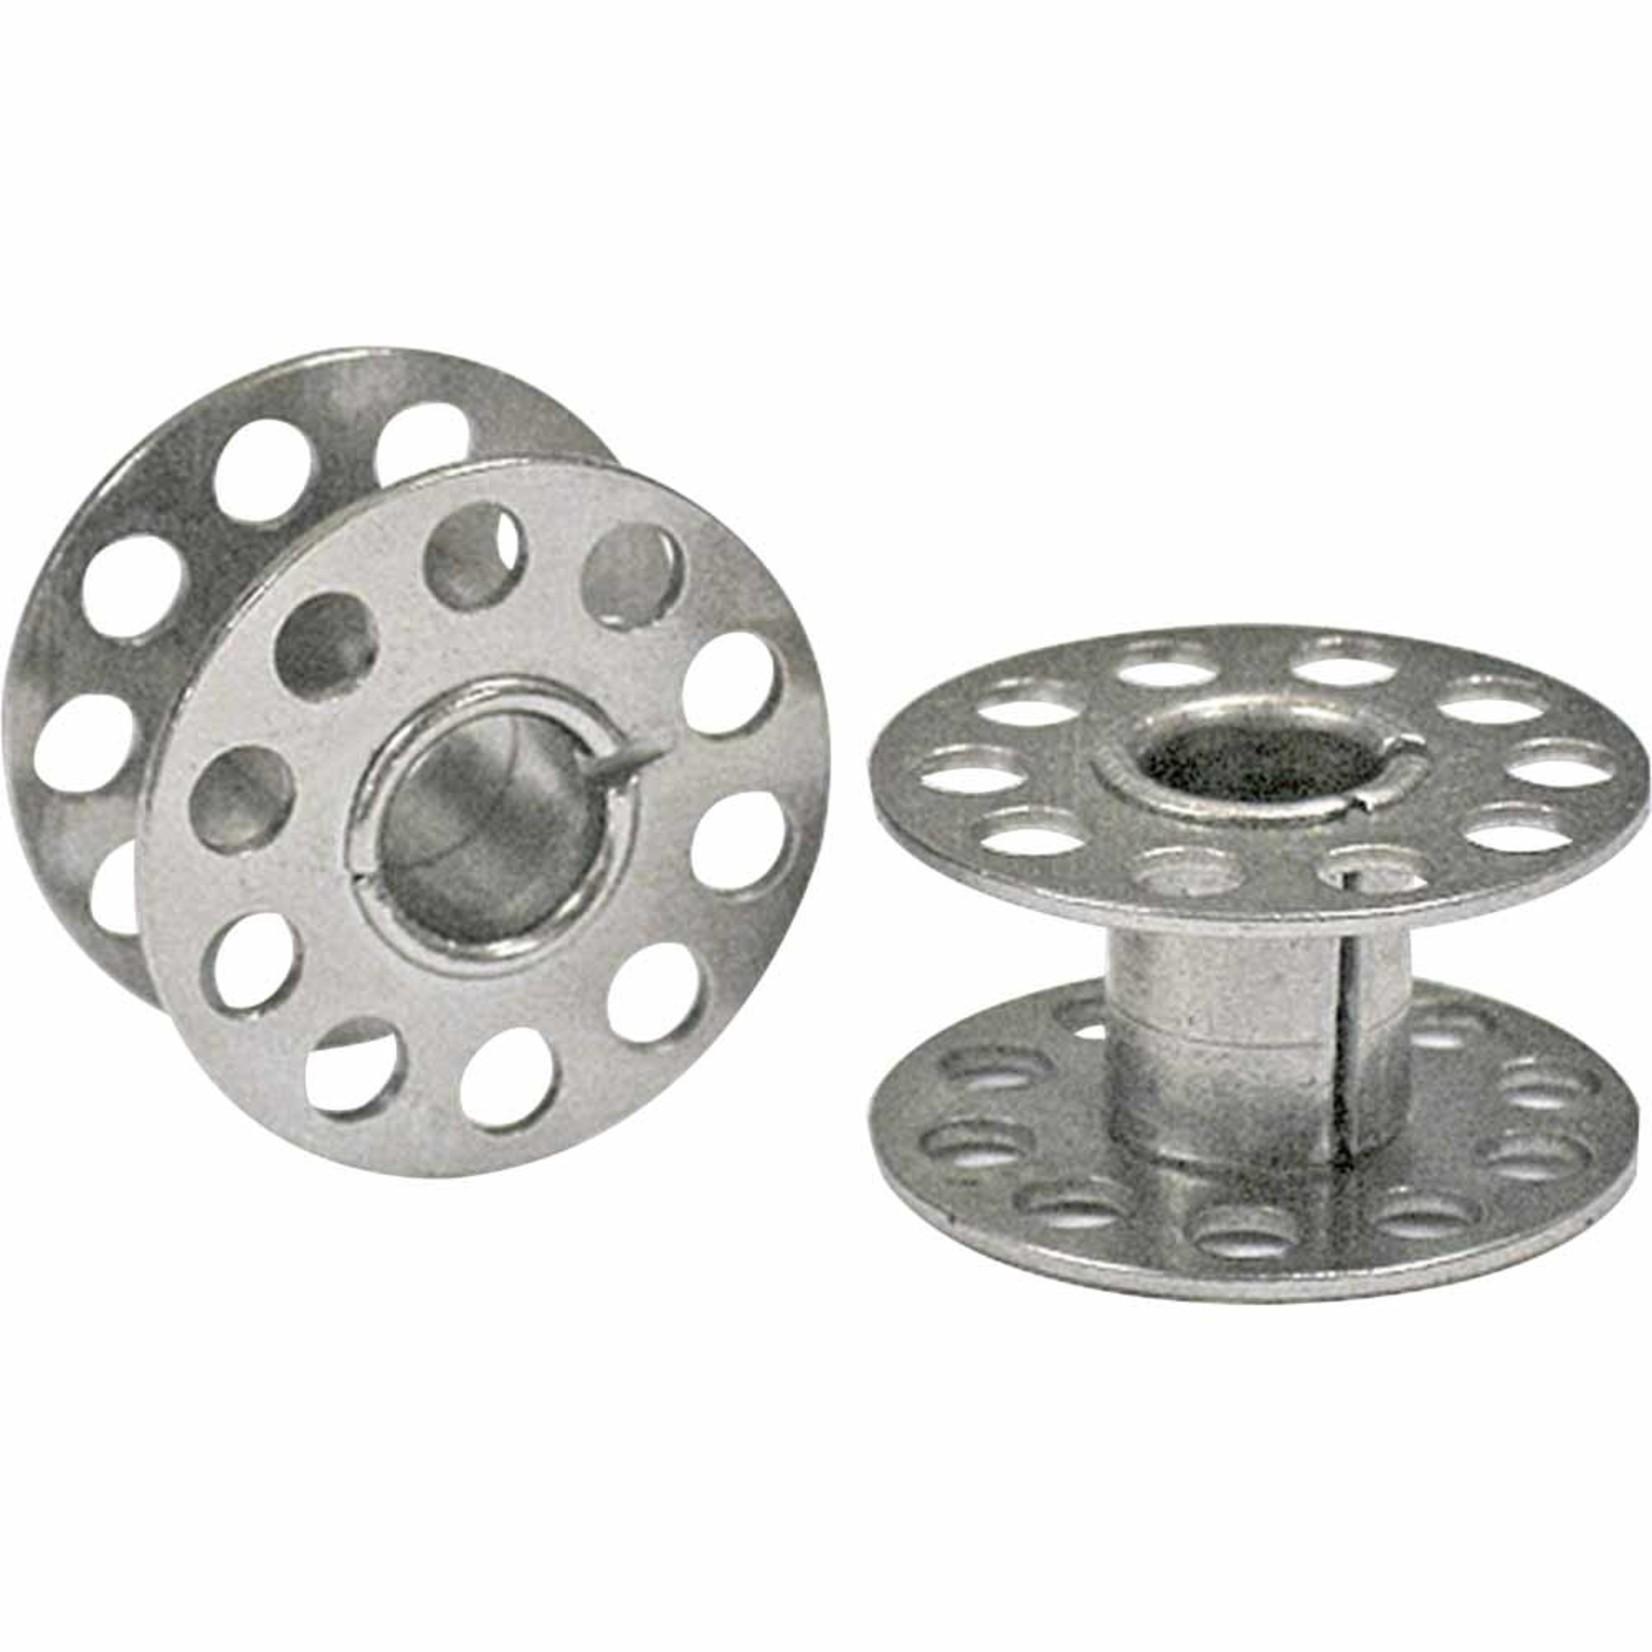 Bobines de métal 10 trous